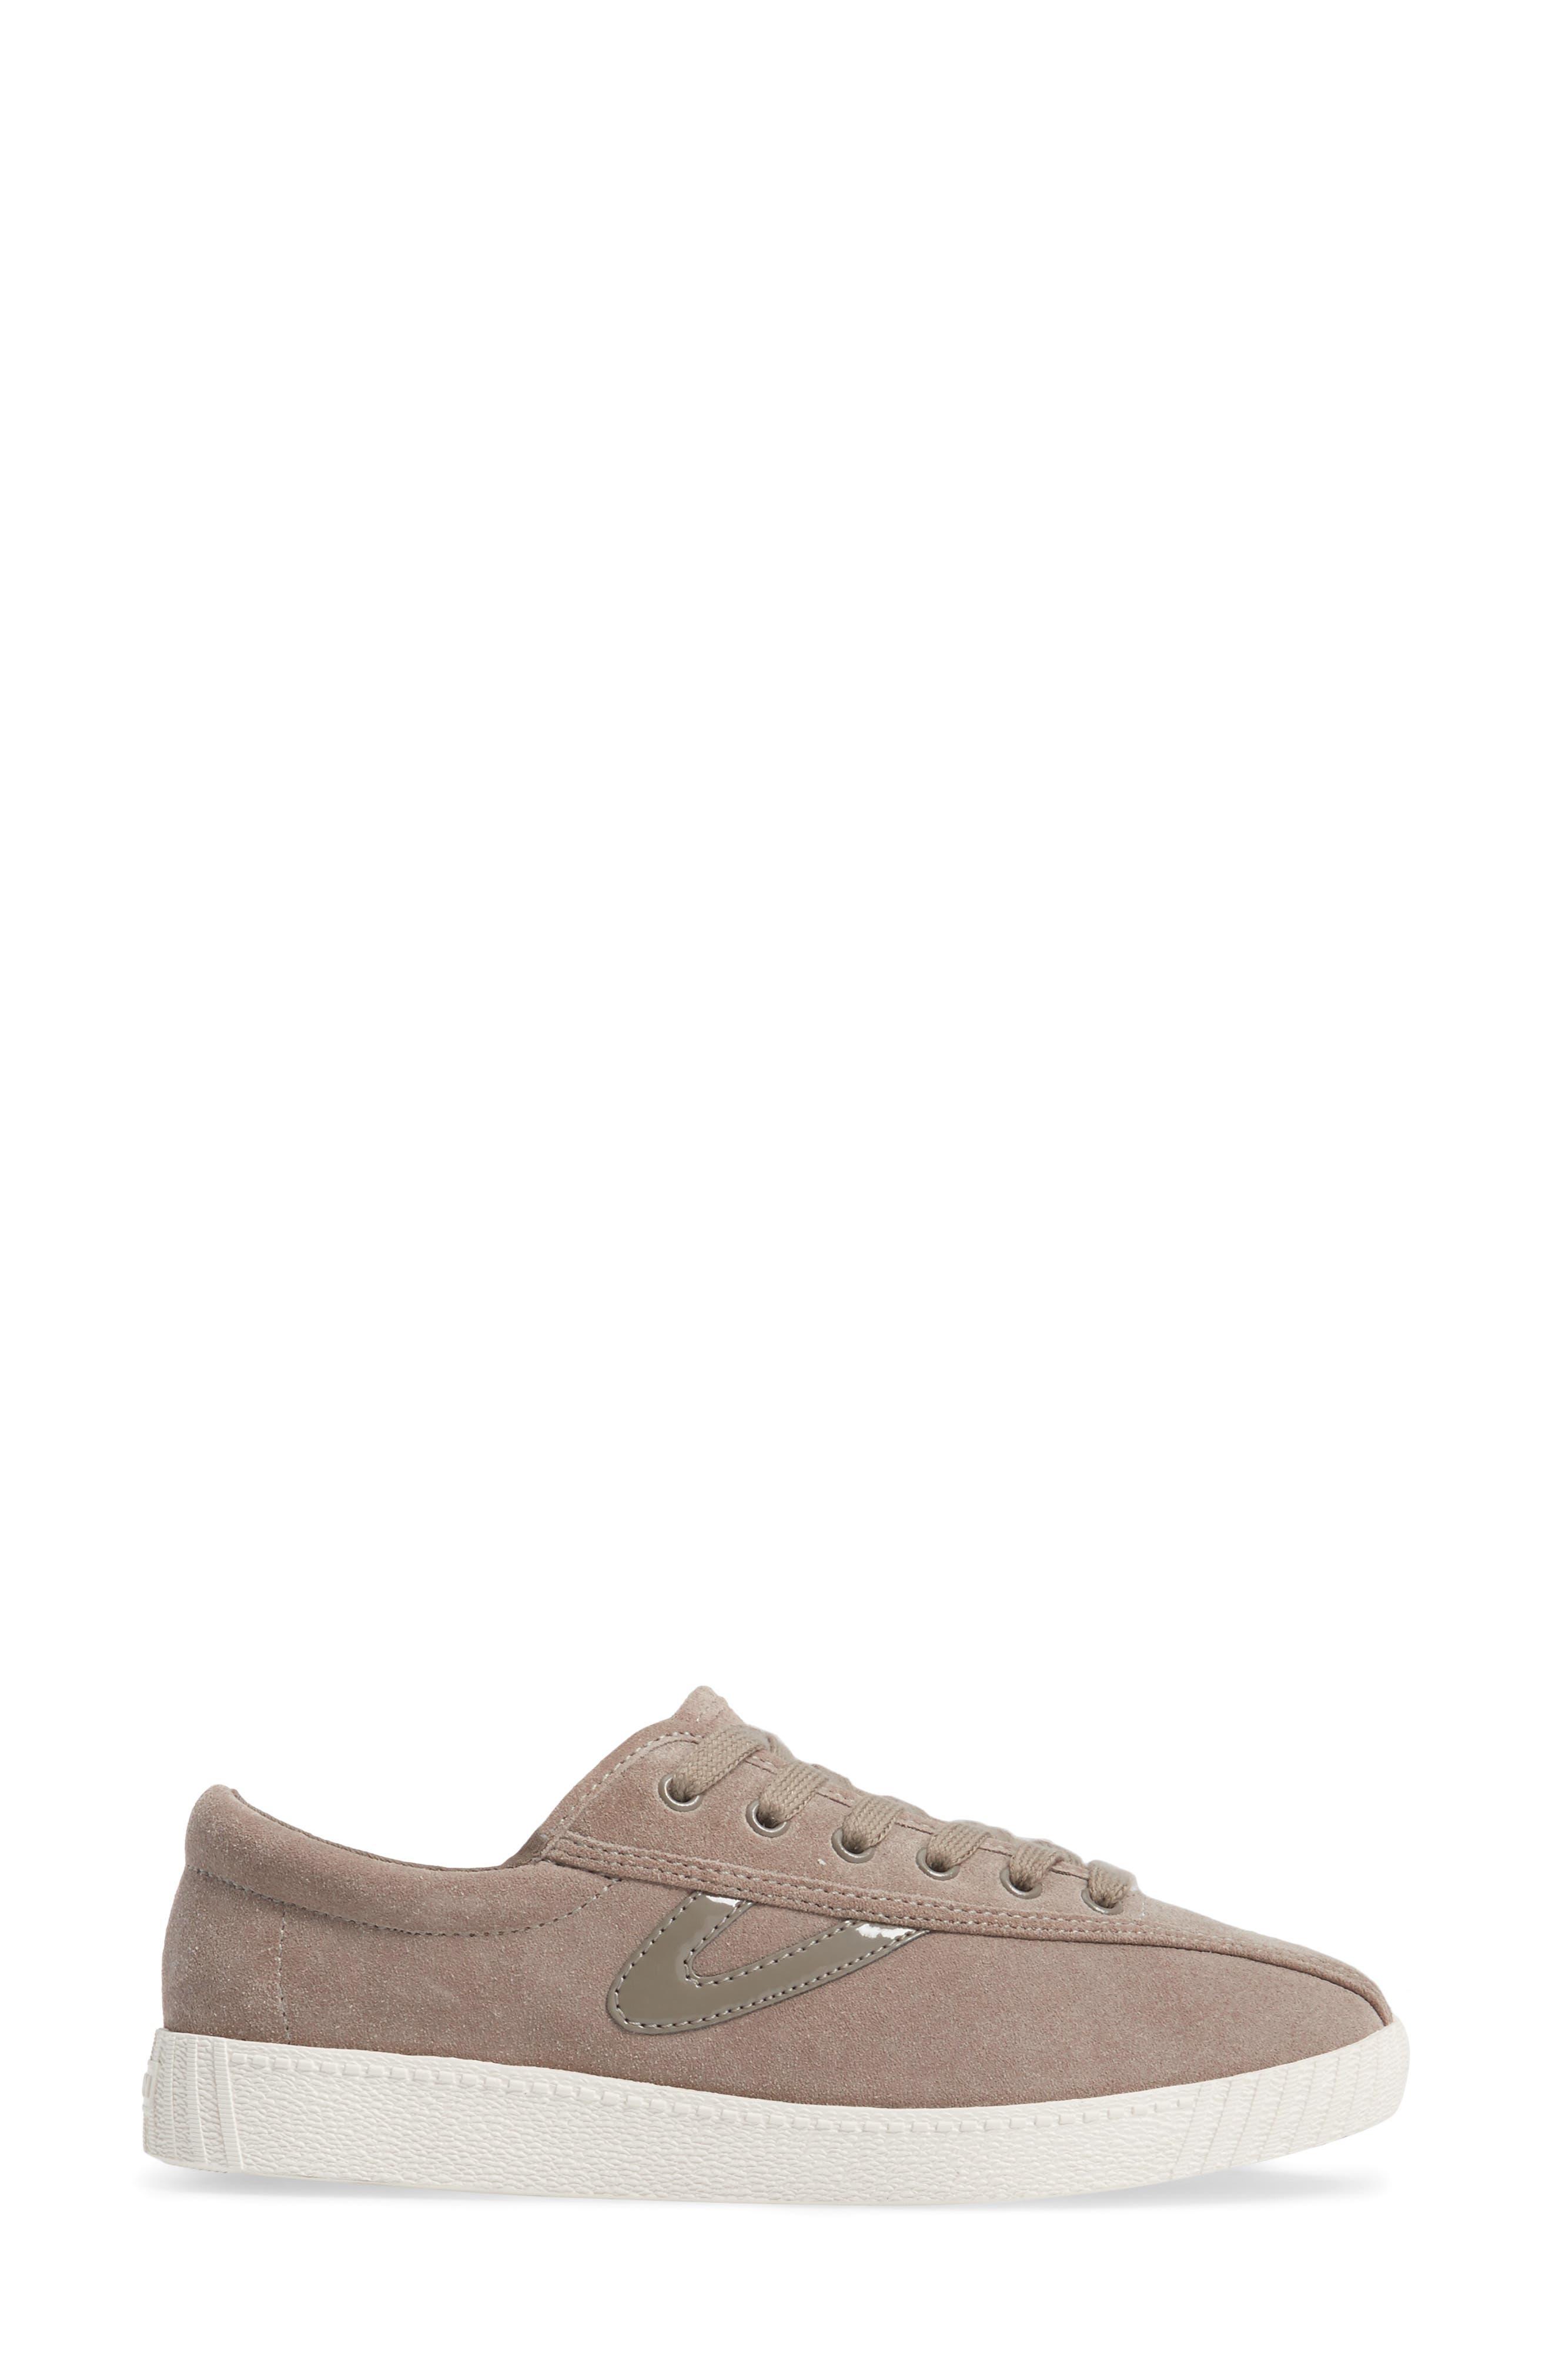 Alternate Image 3  - Tretorn 'Nylite2 Plus' Sneaker (Women)